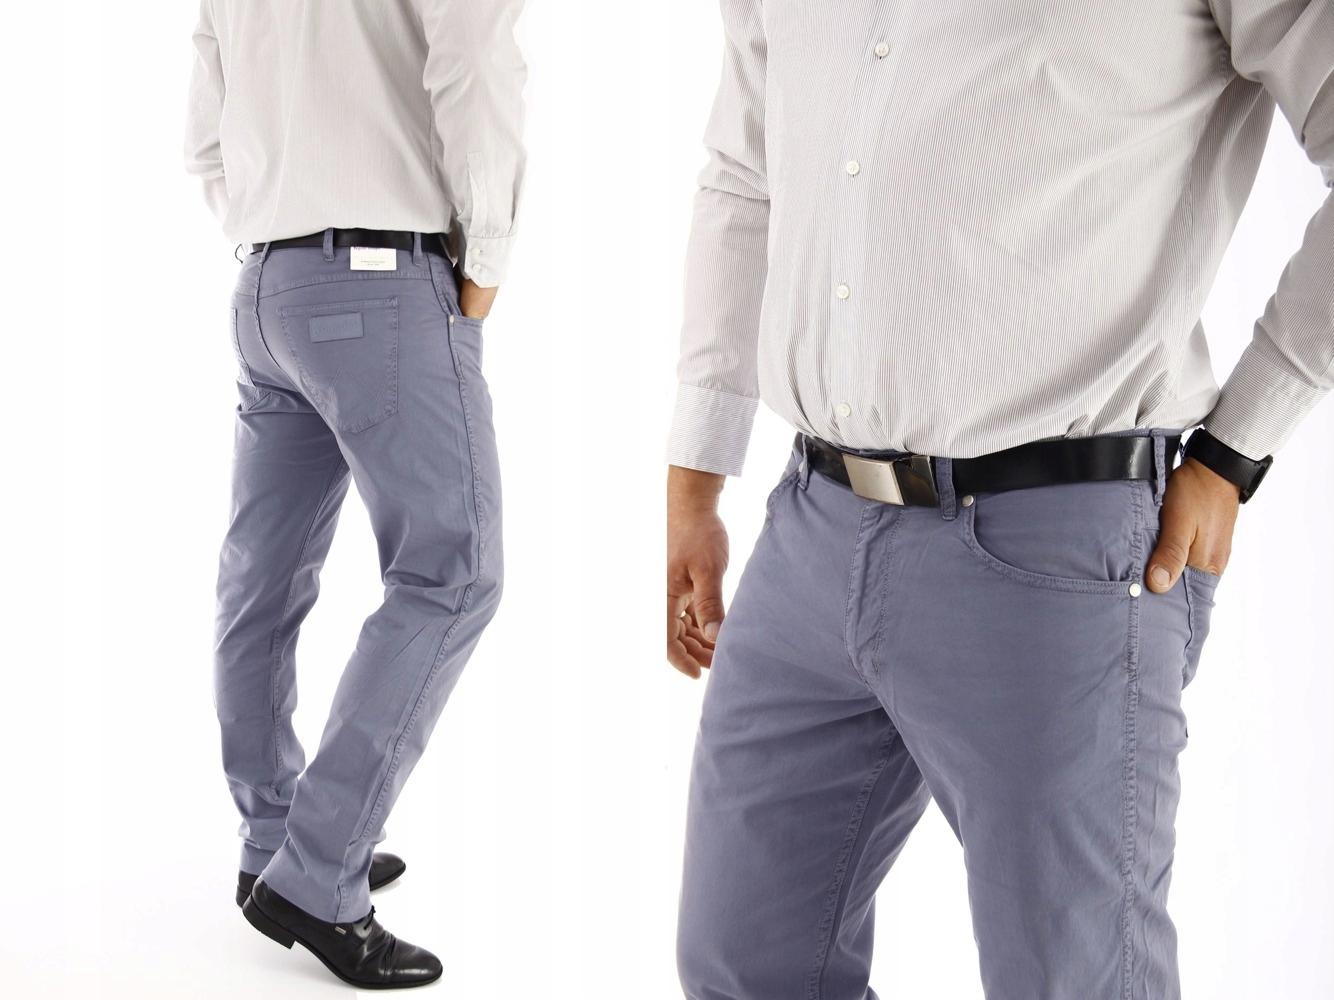 Wrangler Greensboro Flinston Blue spodnie W42 L34